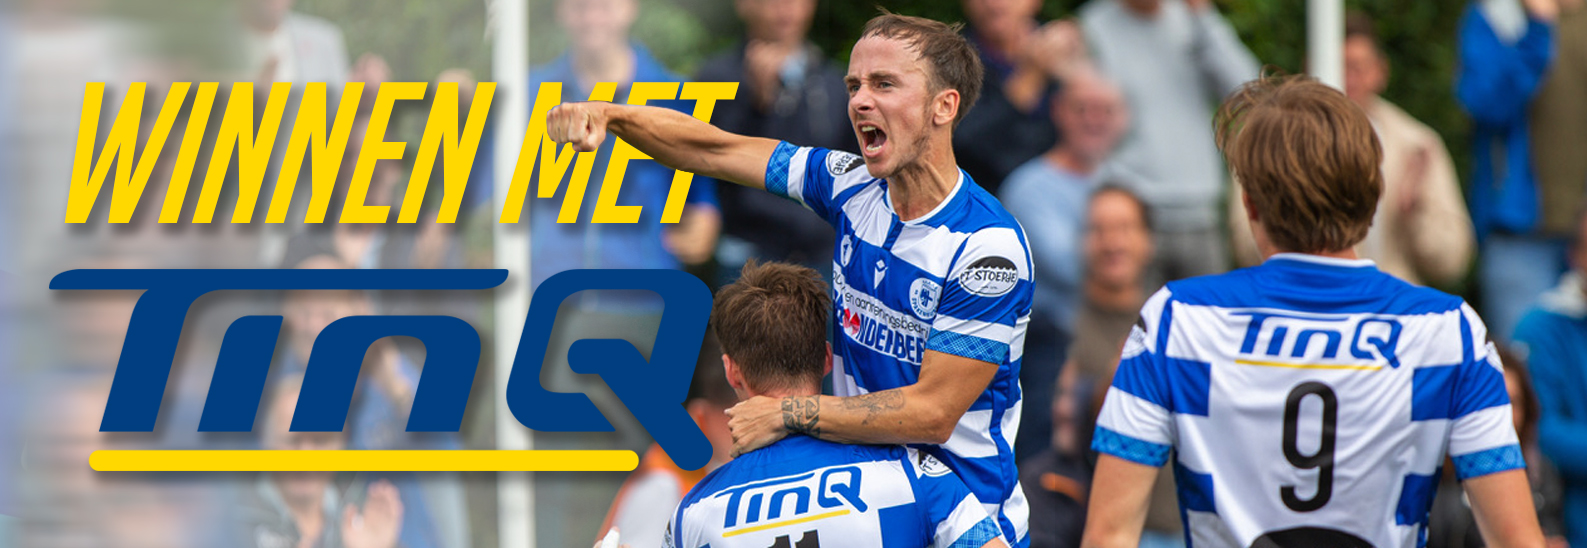 TinQ ook volgend seizoen shirtsponsor van SV Spakenburg